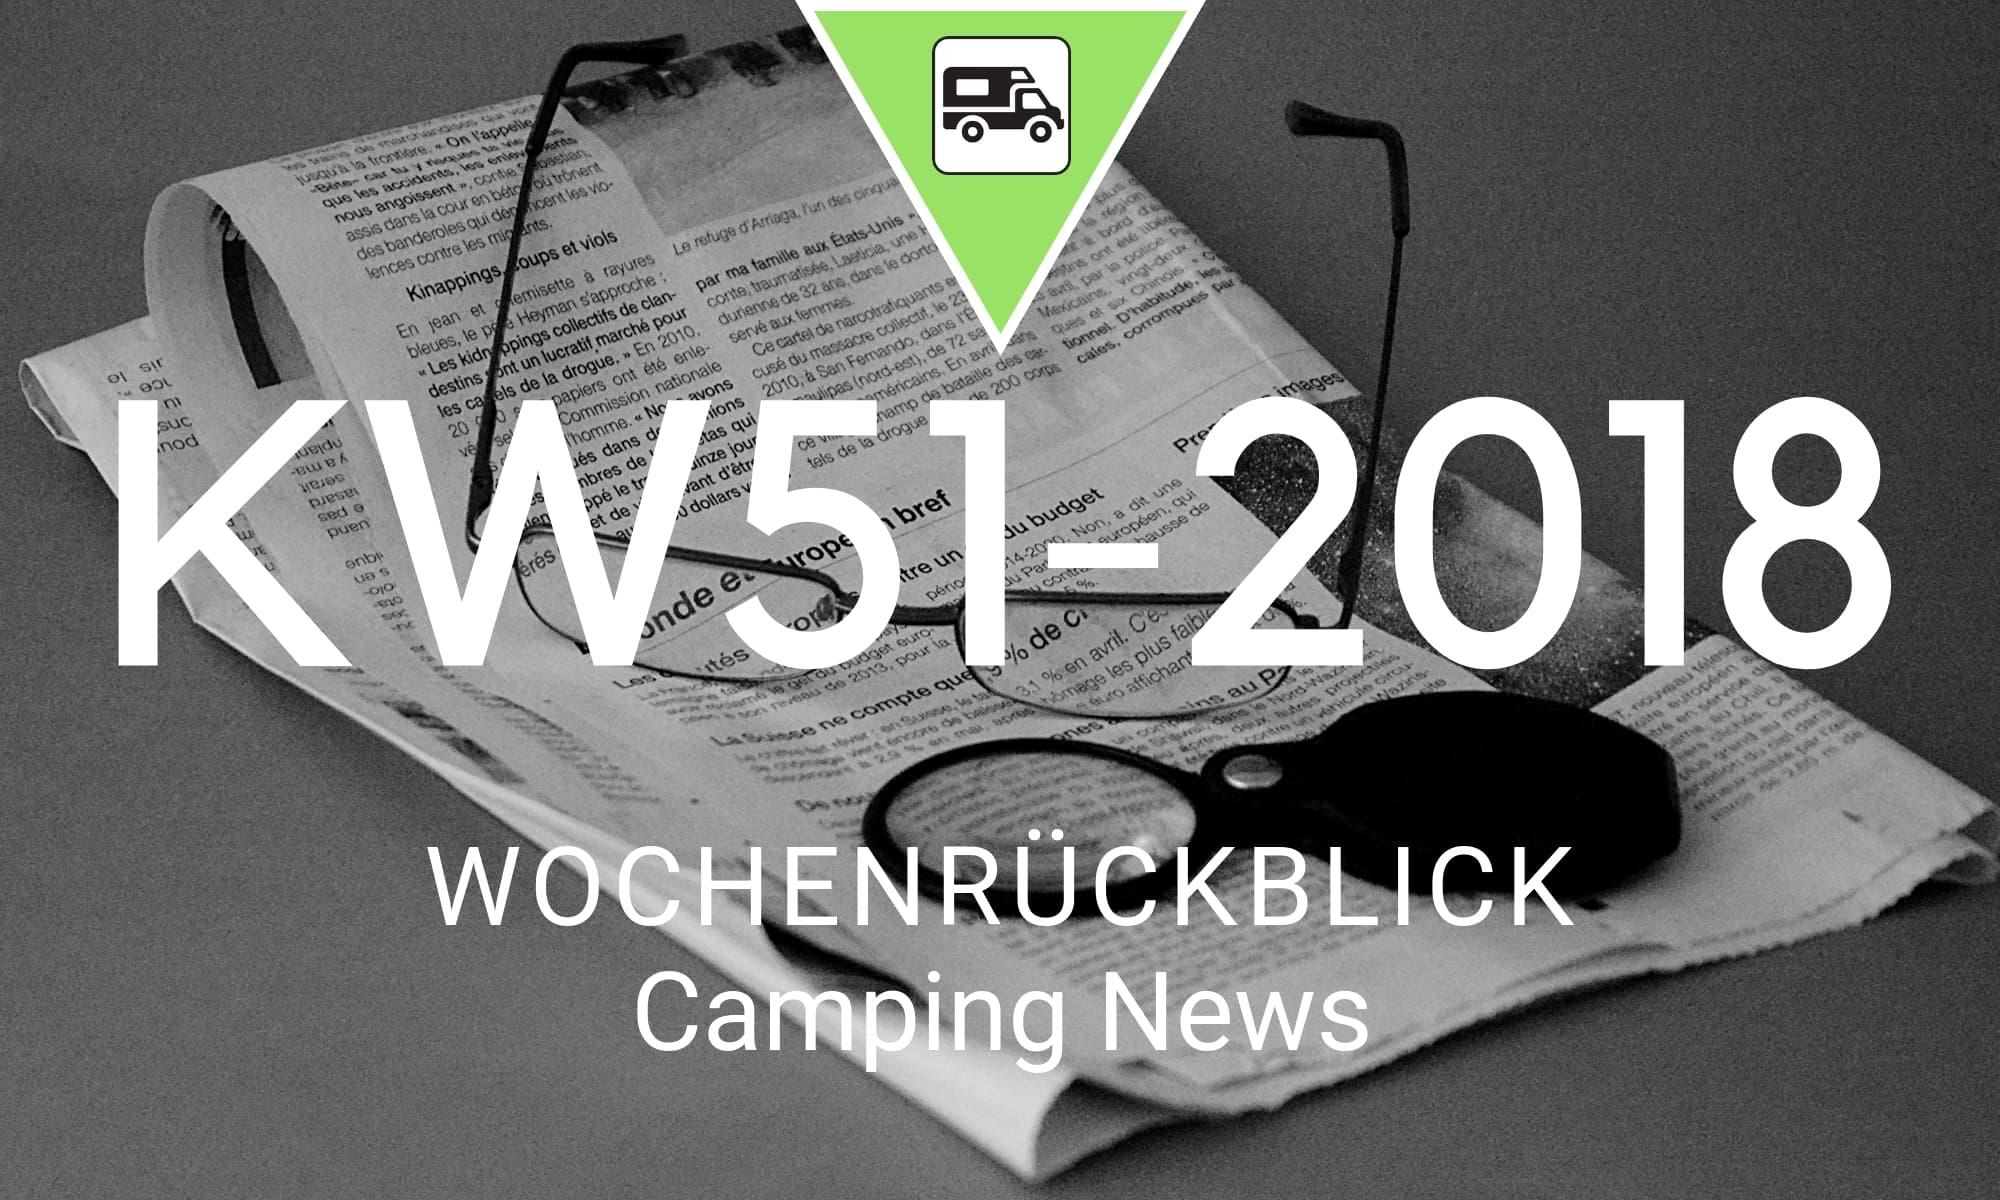 Wochenrückblick Camping News KW51-2018